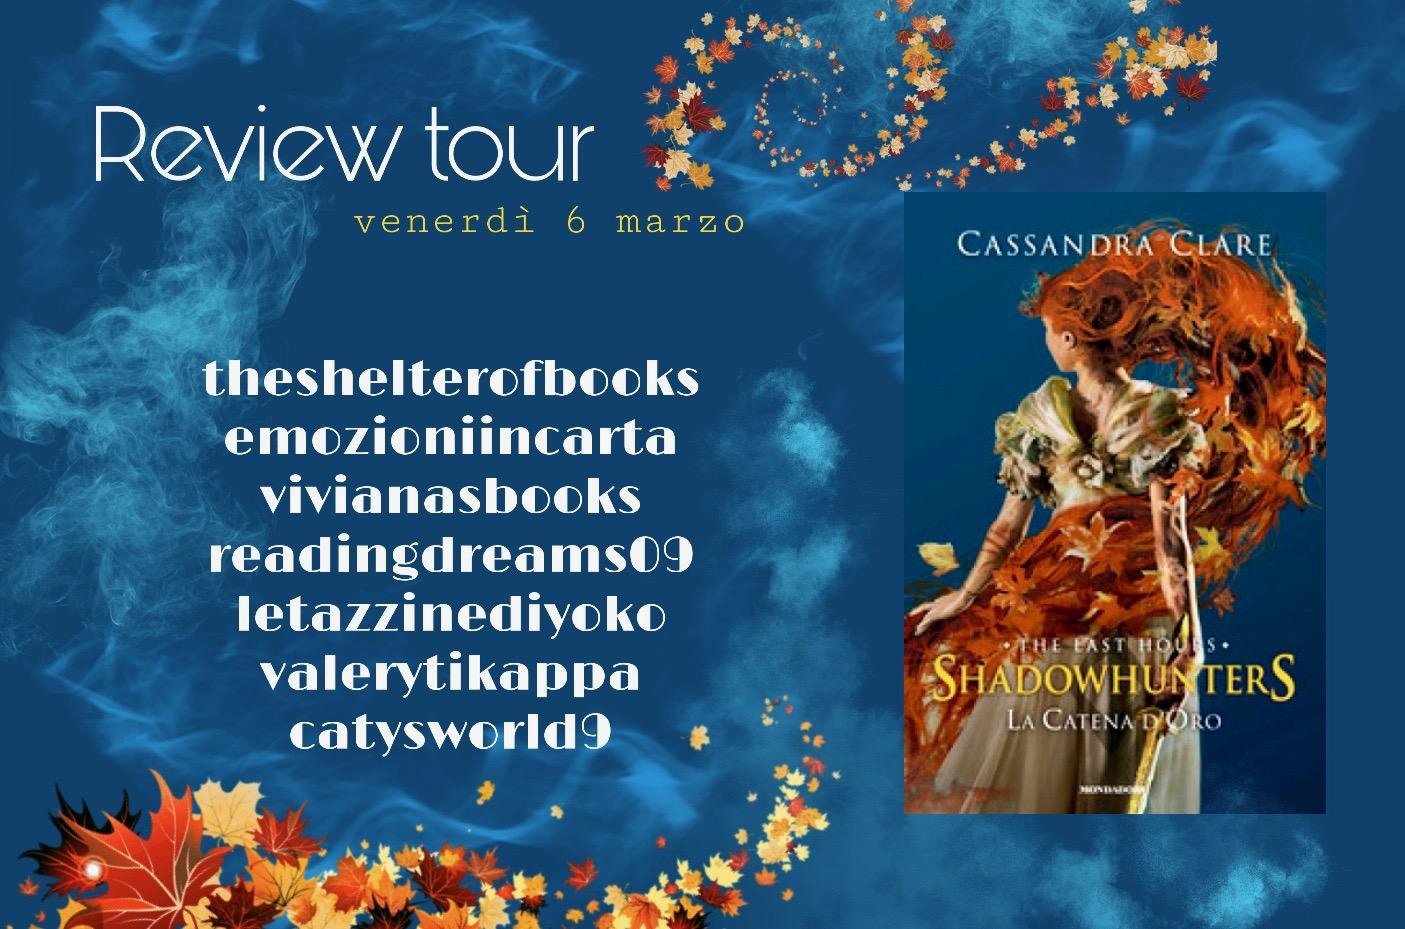 Review Tour: La catena d'oro